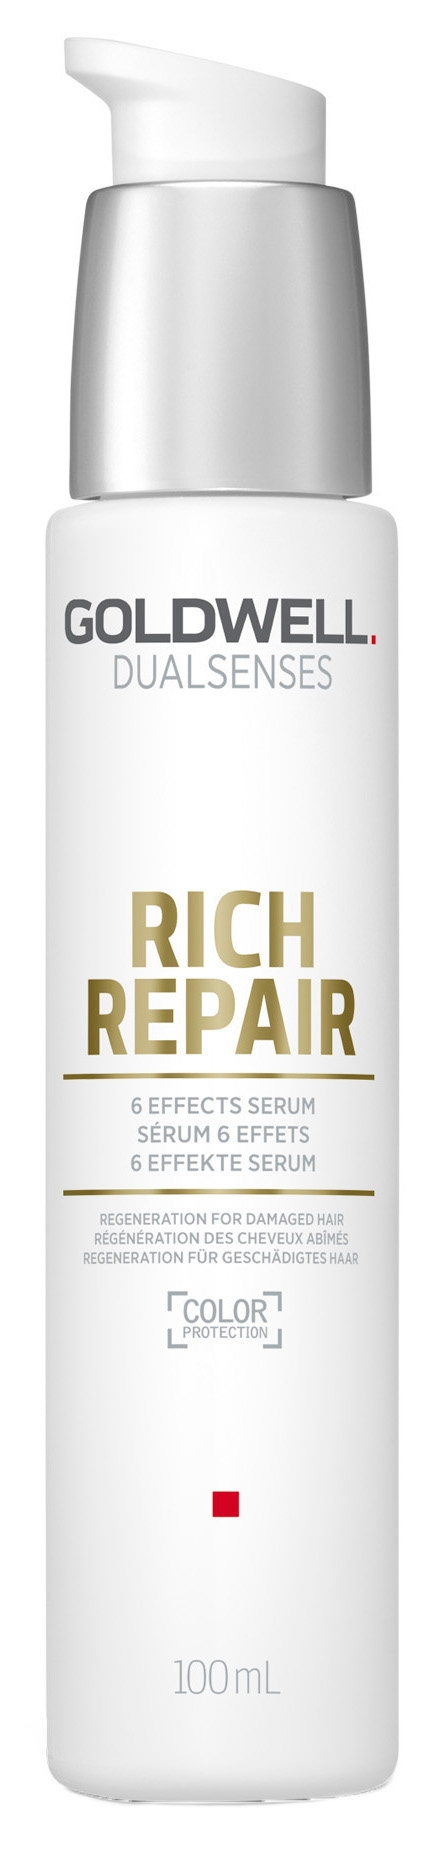 Goldwell Dualsenses Rich Repair 6 Effect (W) serum regeneracyjne do włosów 100ml